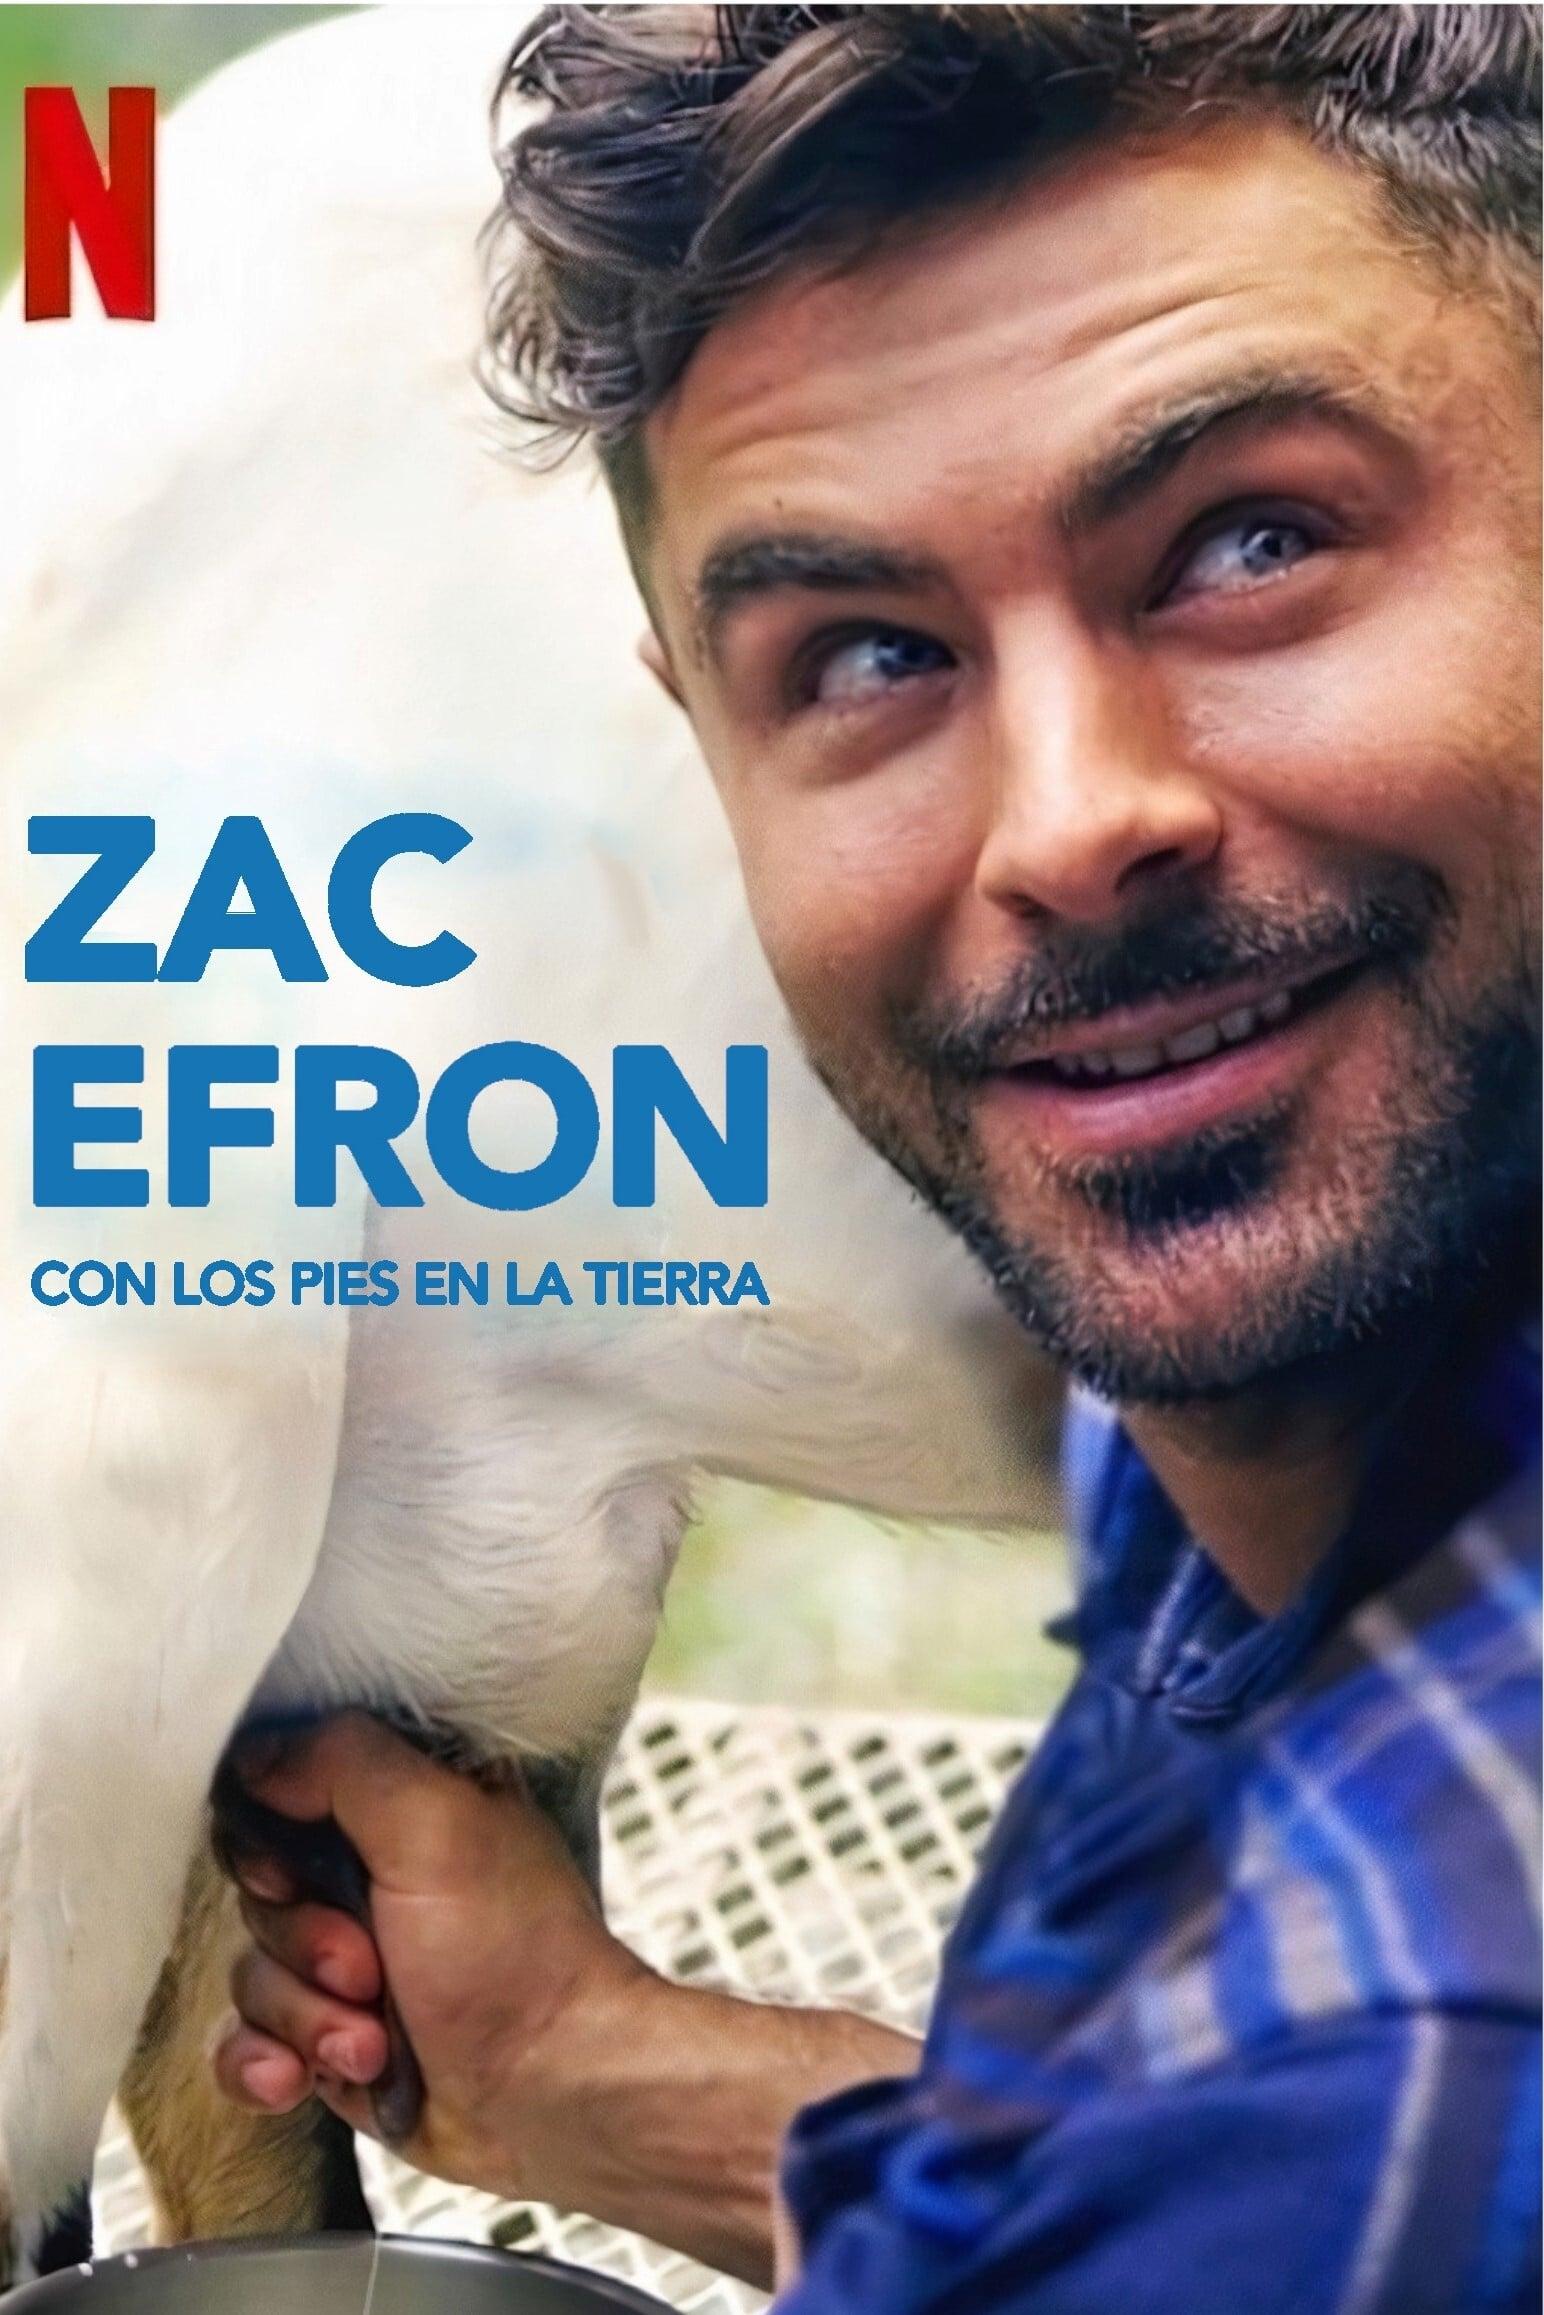 与扎克·埃夫隆环游地球 Down to Earth with Zac Efron (2020) Netflix 中文字幕